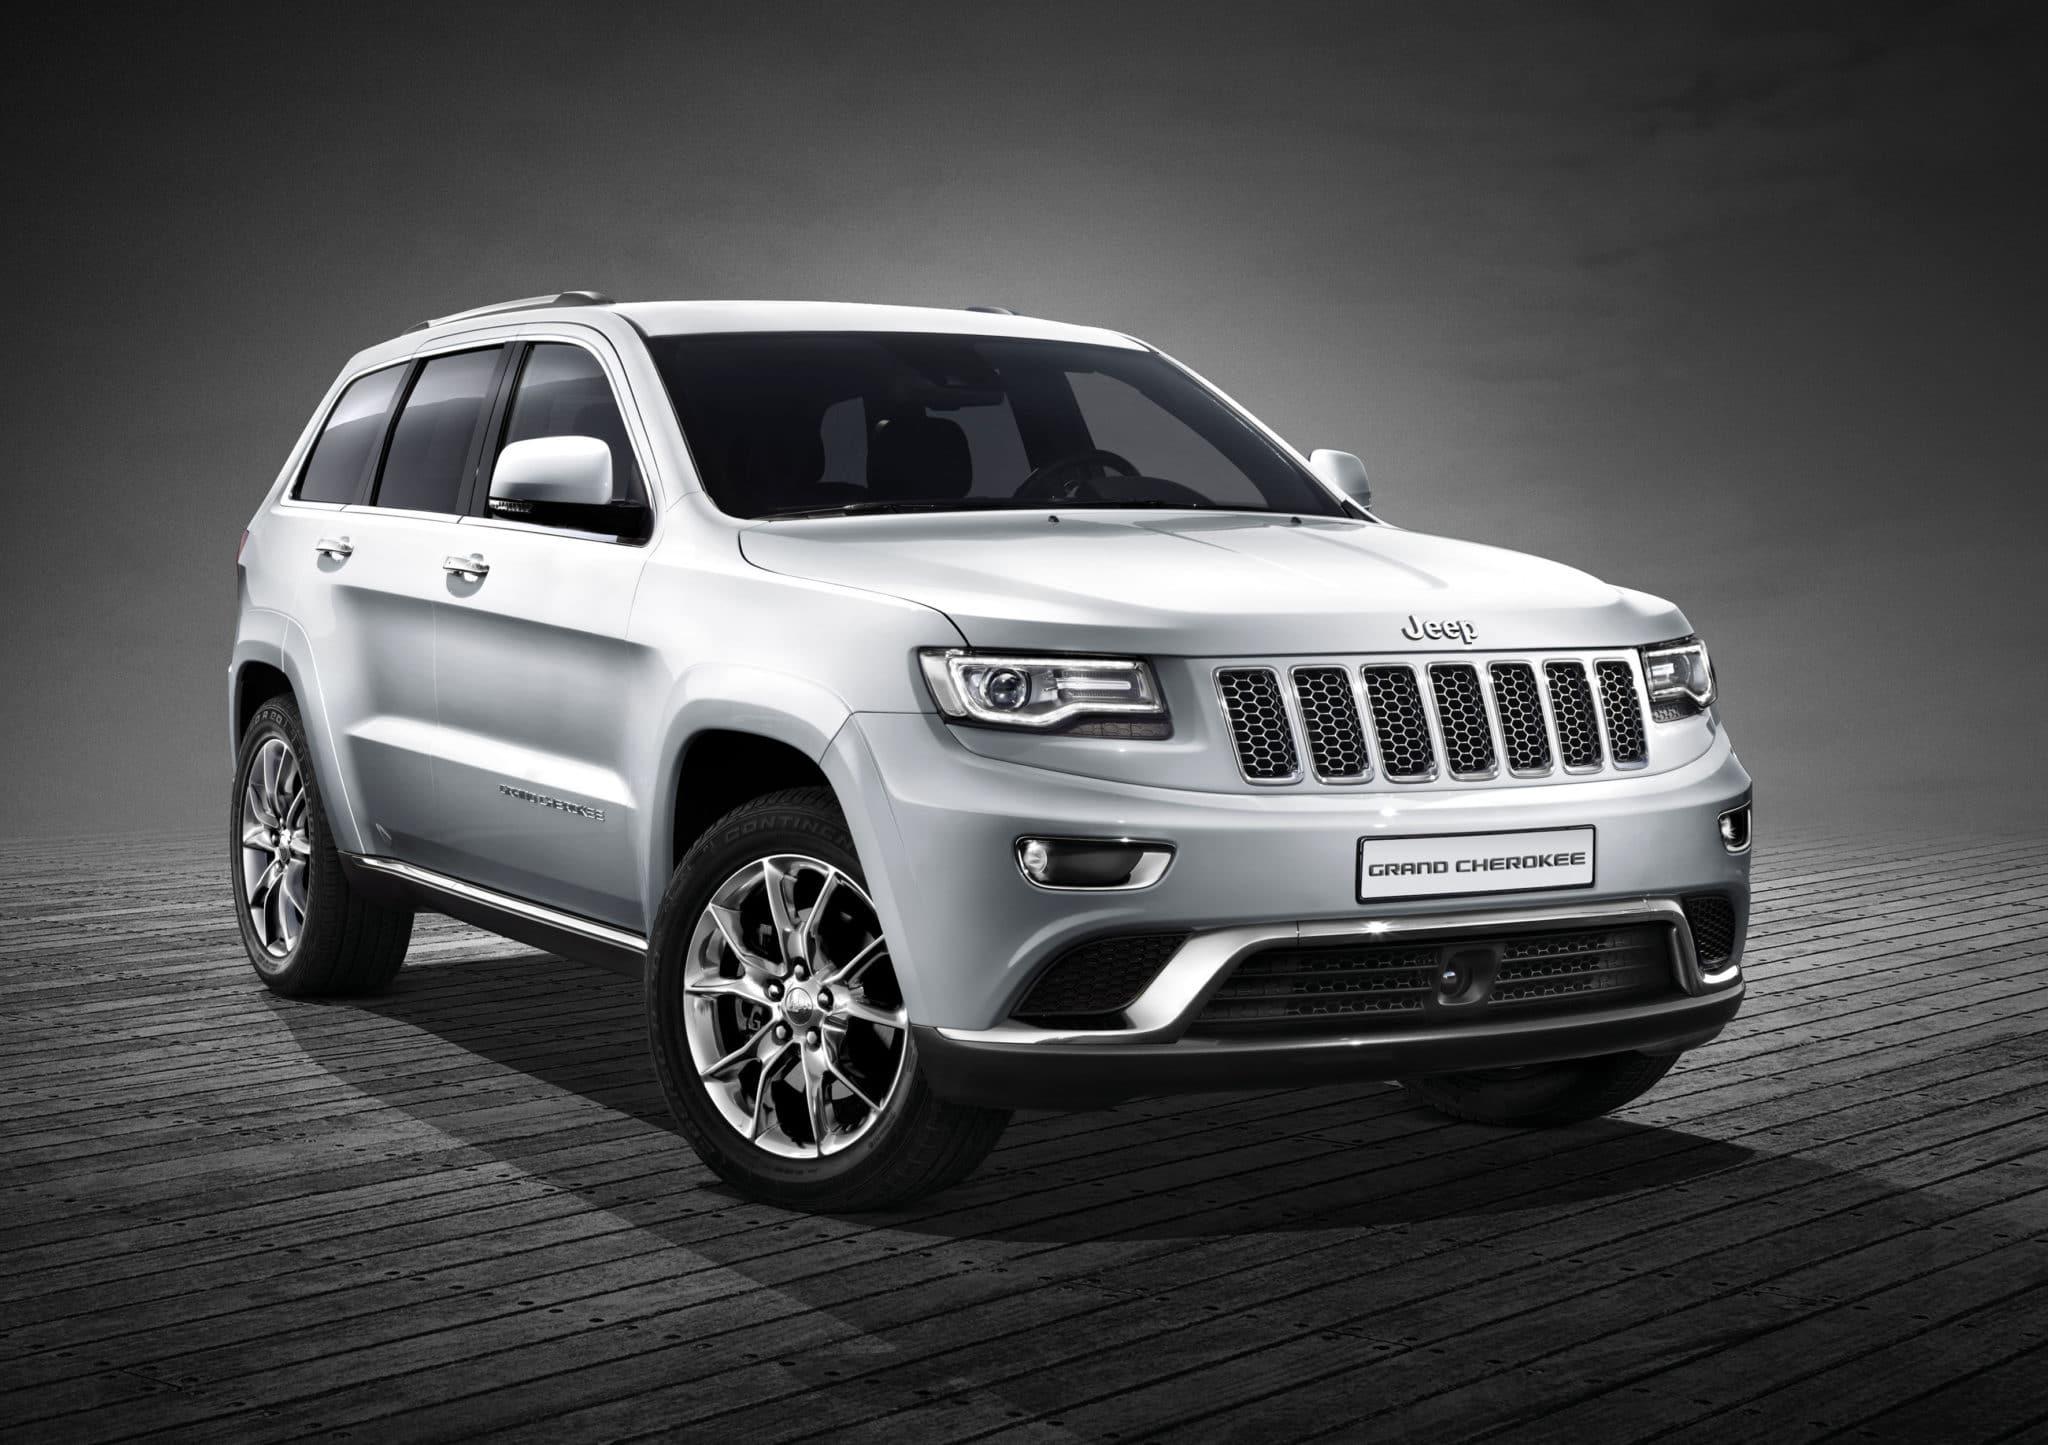 Nuova Jeep Grand Cherokee MY 2014: anteprima al Salone Internazionale di Ginevra